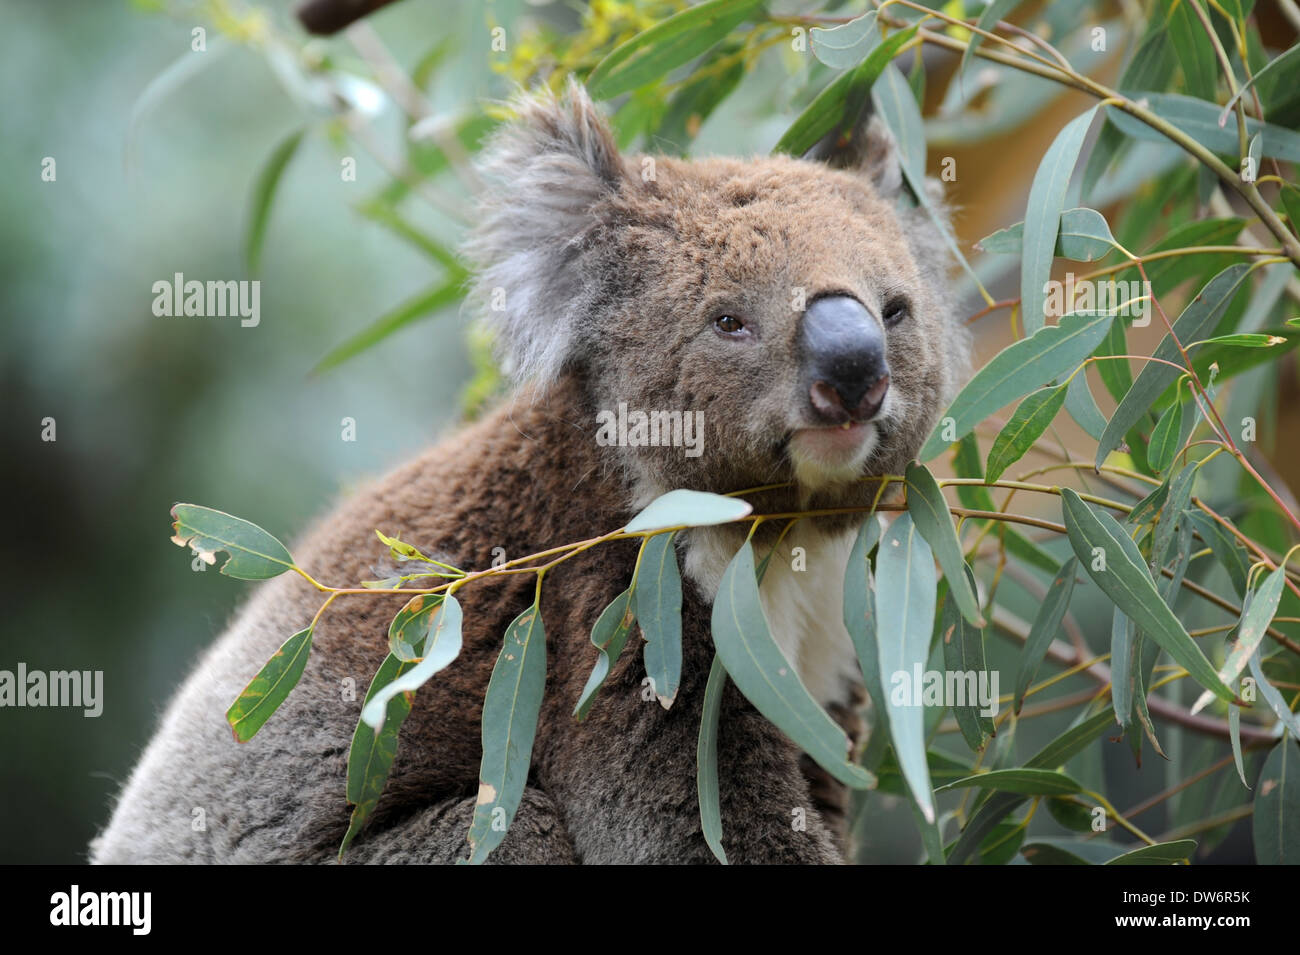 an australian koala in its natural habitat stock photo royalty